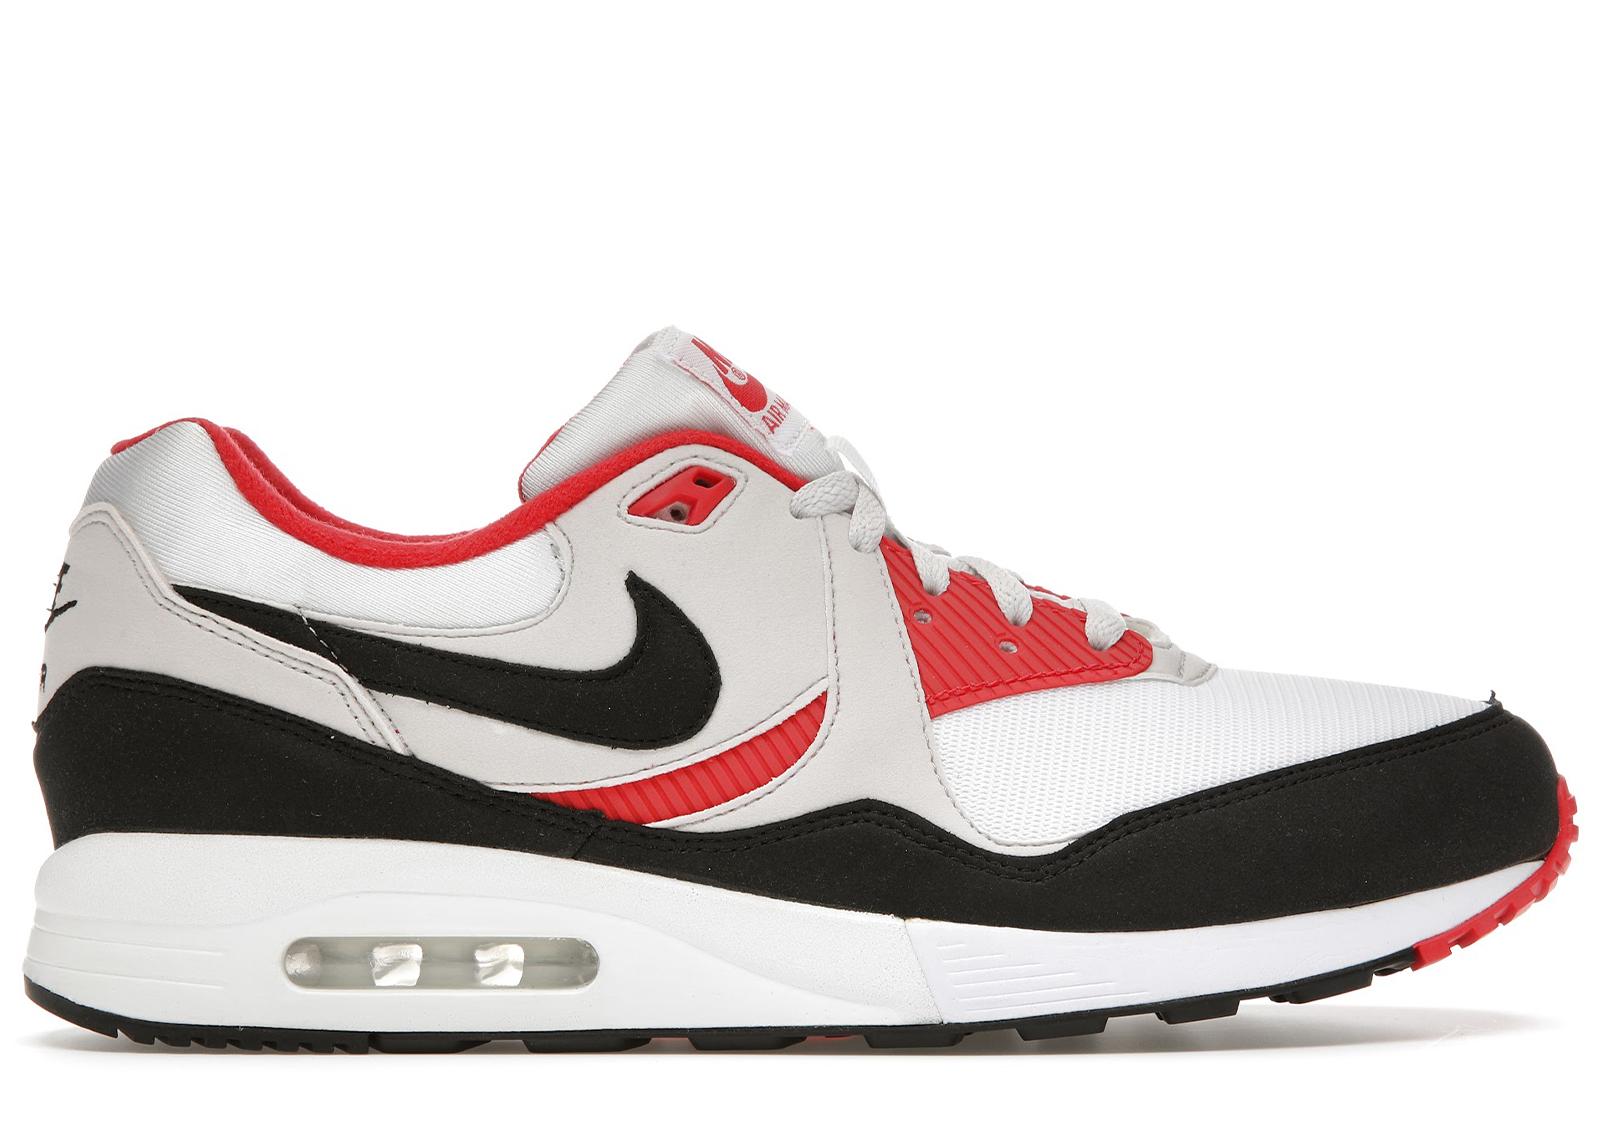 Nike Air Max Light White Black Grey Red